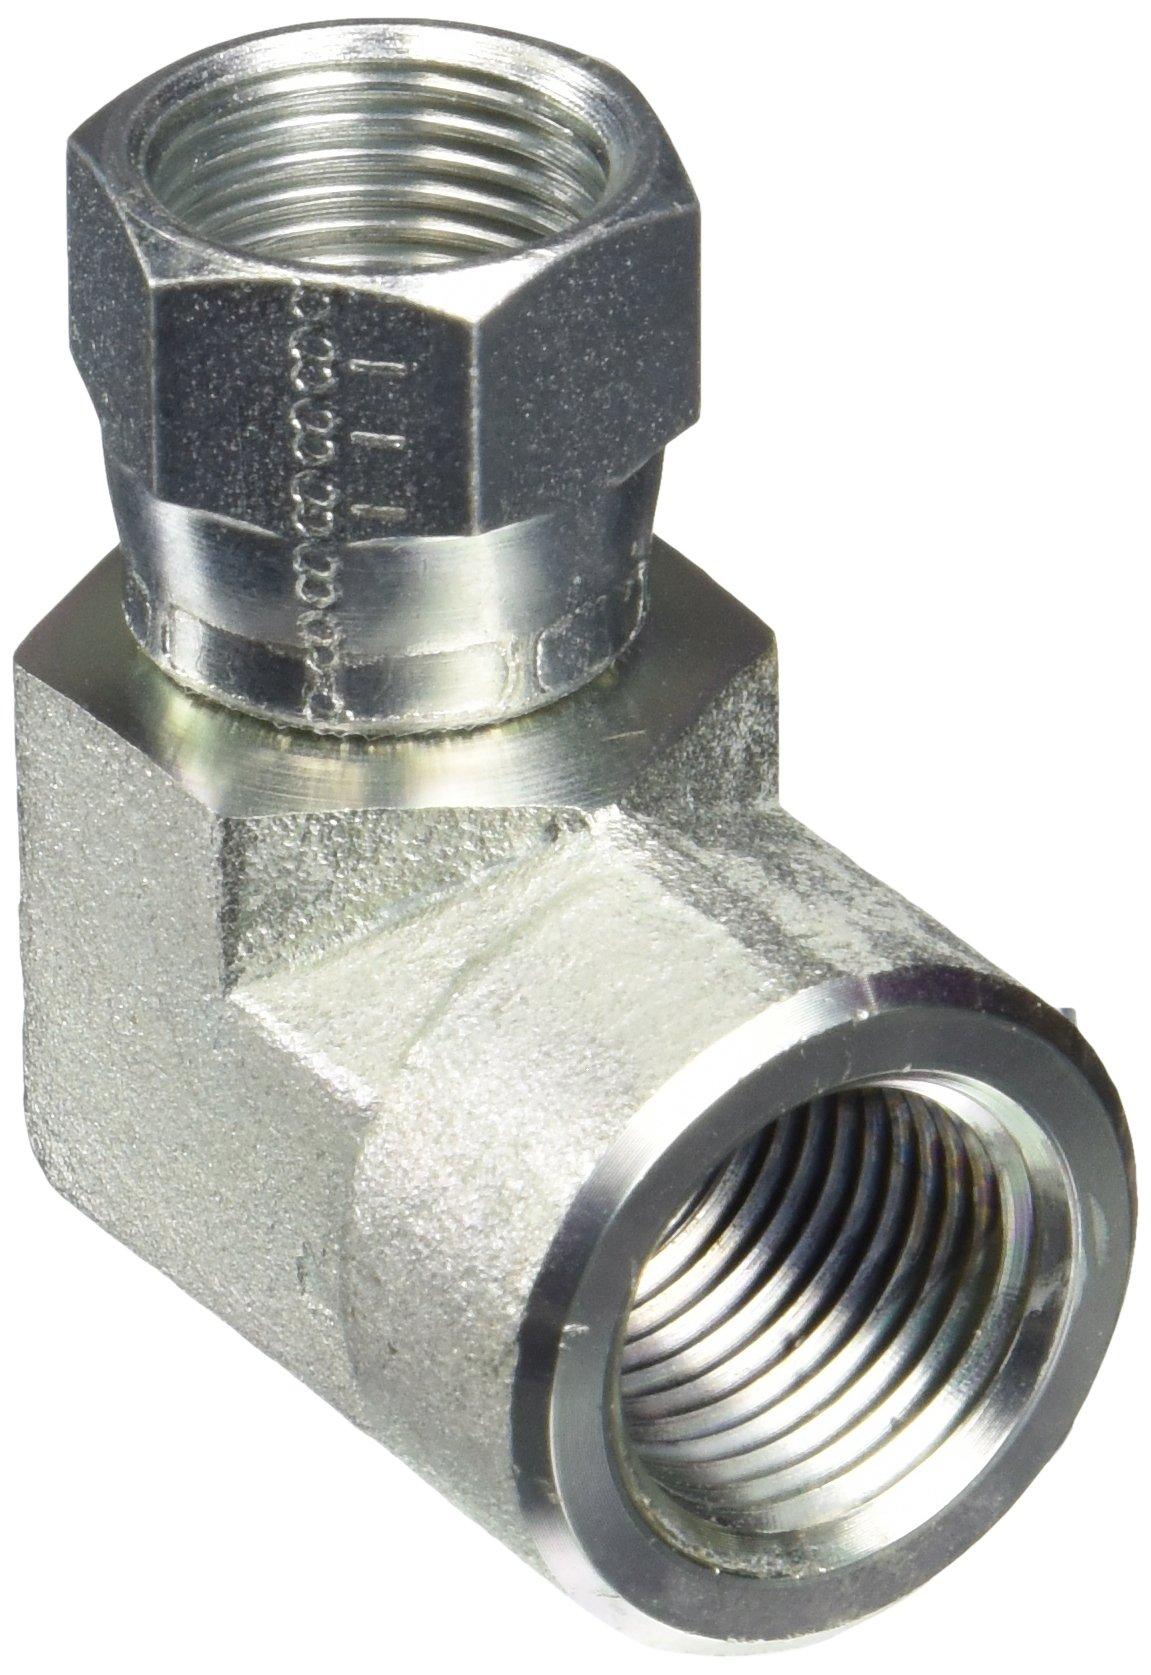 Eaton Aeroquip 2244-8-8S 90 Degree Swivel to Female Pipe, JIC 37 Degree & NPT End Types, Carbon Steel, 1/2 JIC(f) x 1/2 NPT(f) End Size, 1/2'' Tube OD, 1/2'' Female Pipe Size by Aeroquip (Image #1)